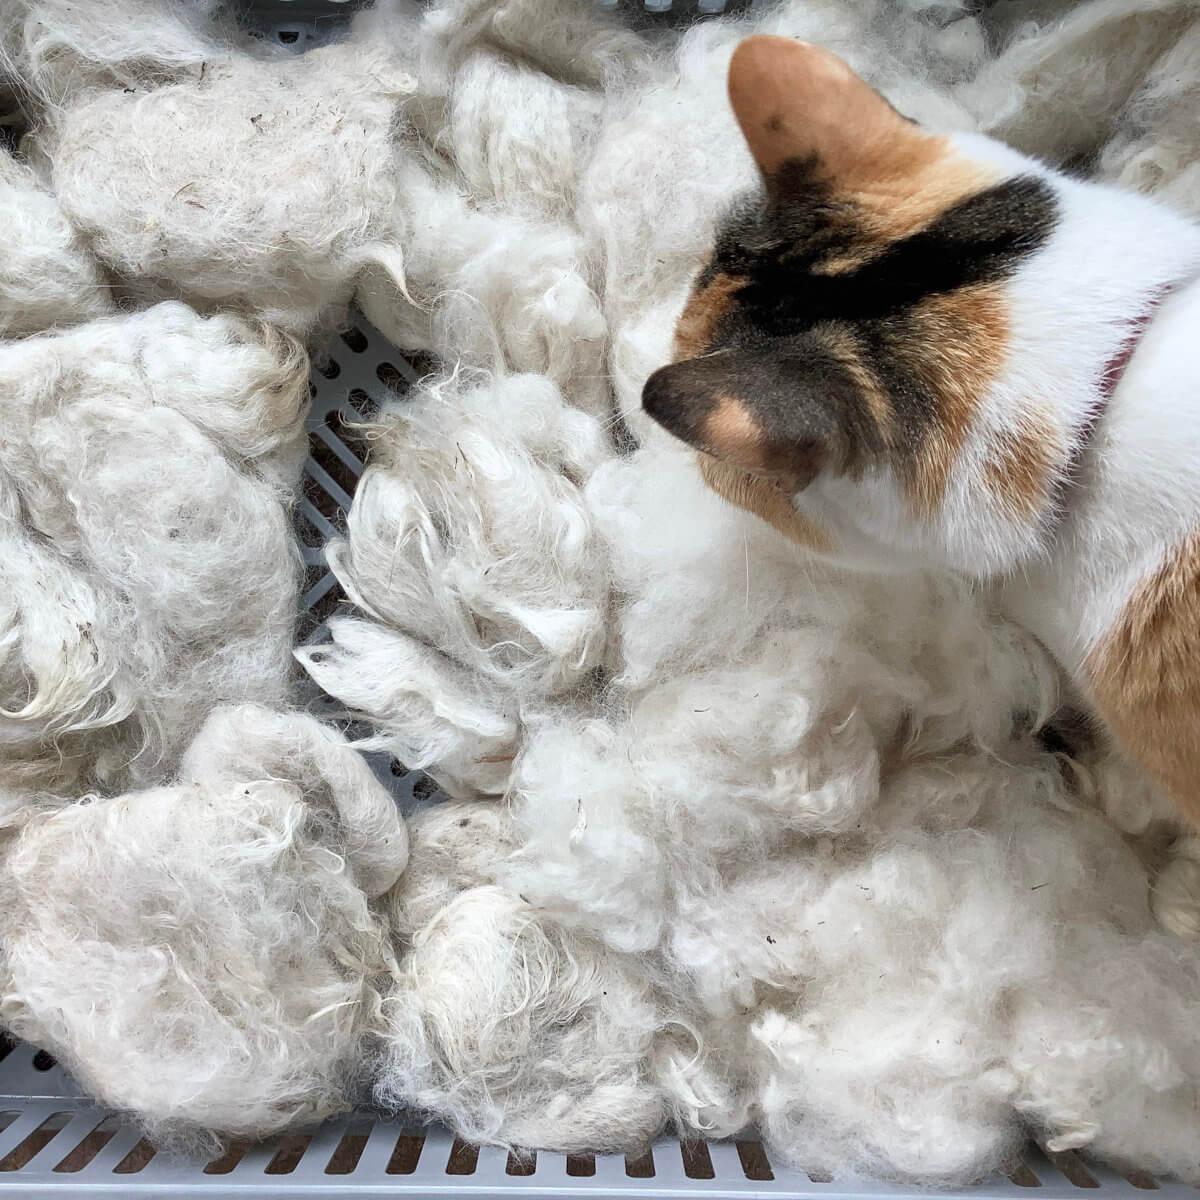 Drying the fiber